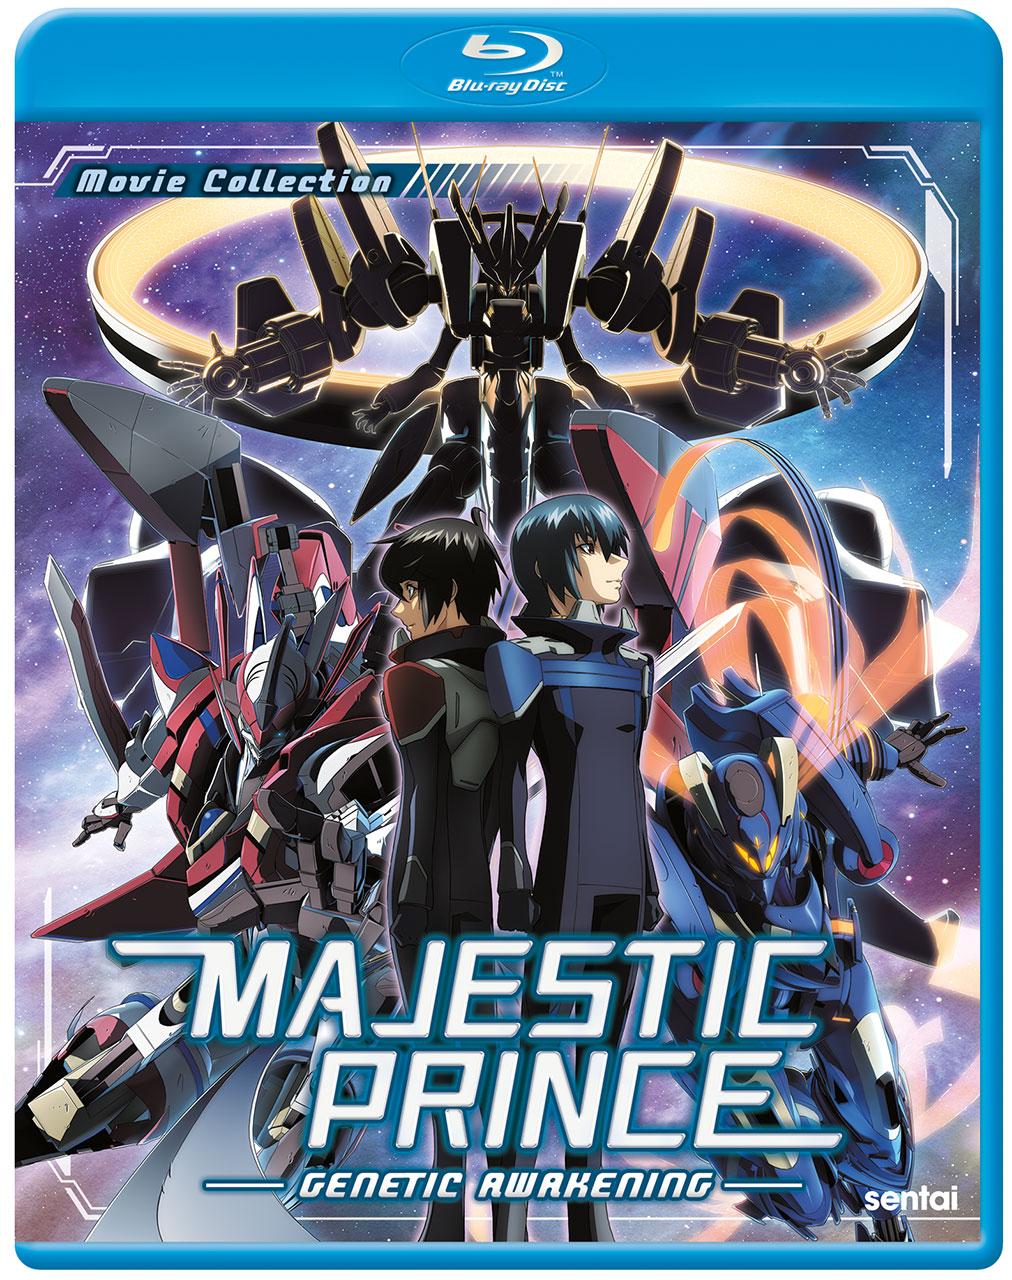 Majestic Prince Genetic Awakening Cover